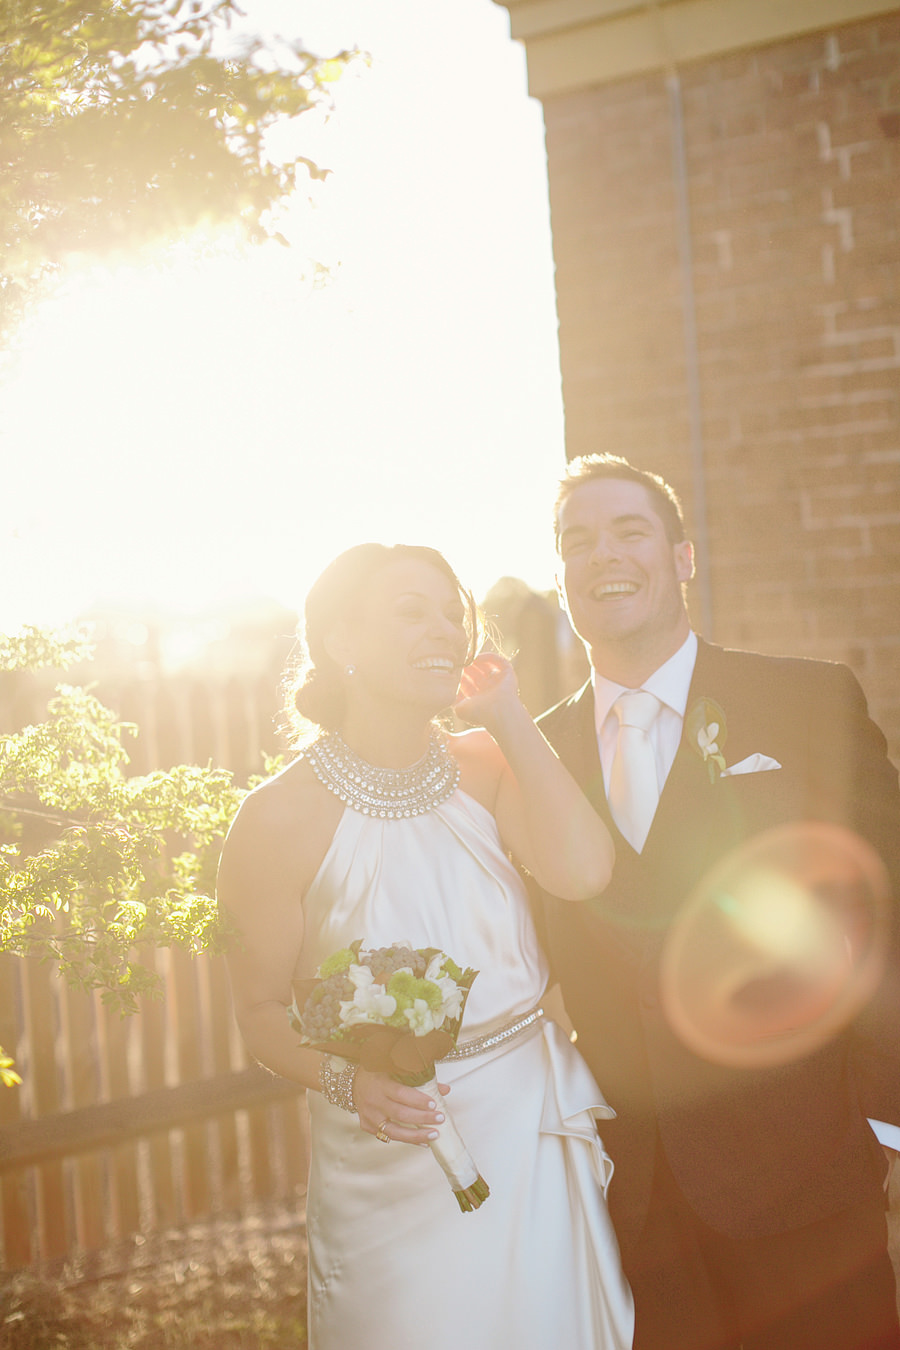 Millthorpe Wedding Photographers: Bridal Party Portraits